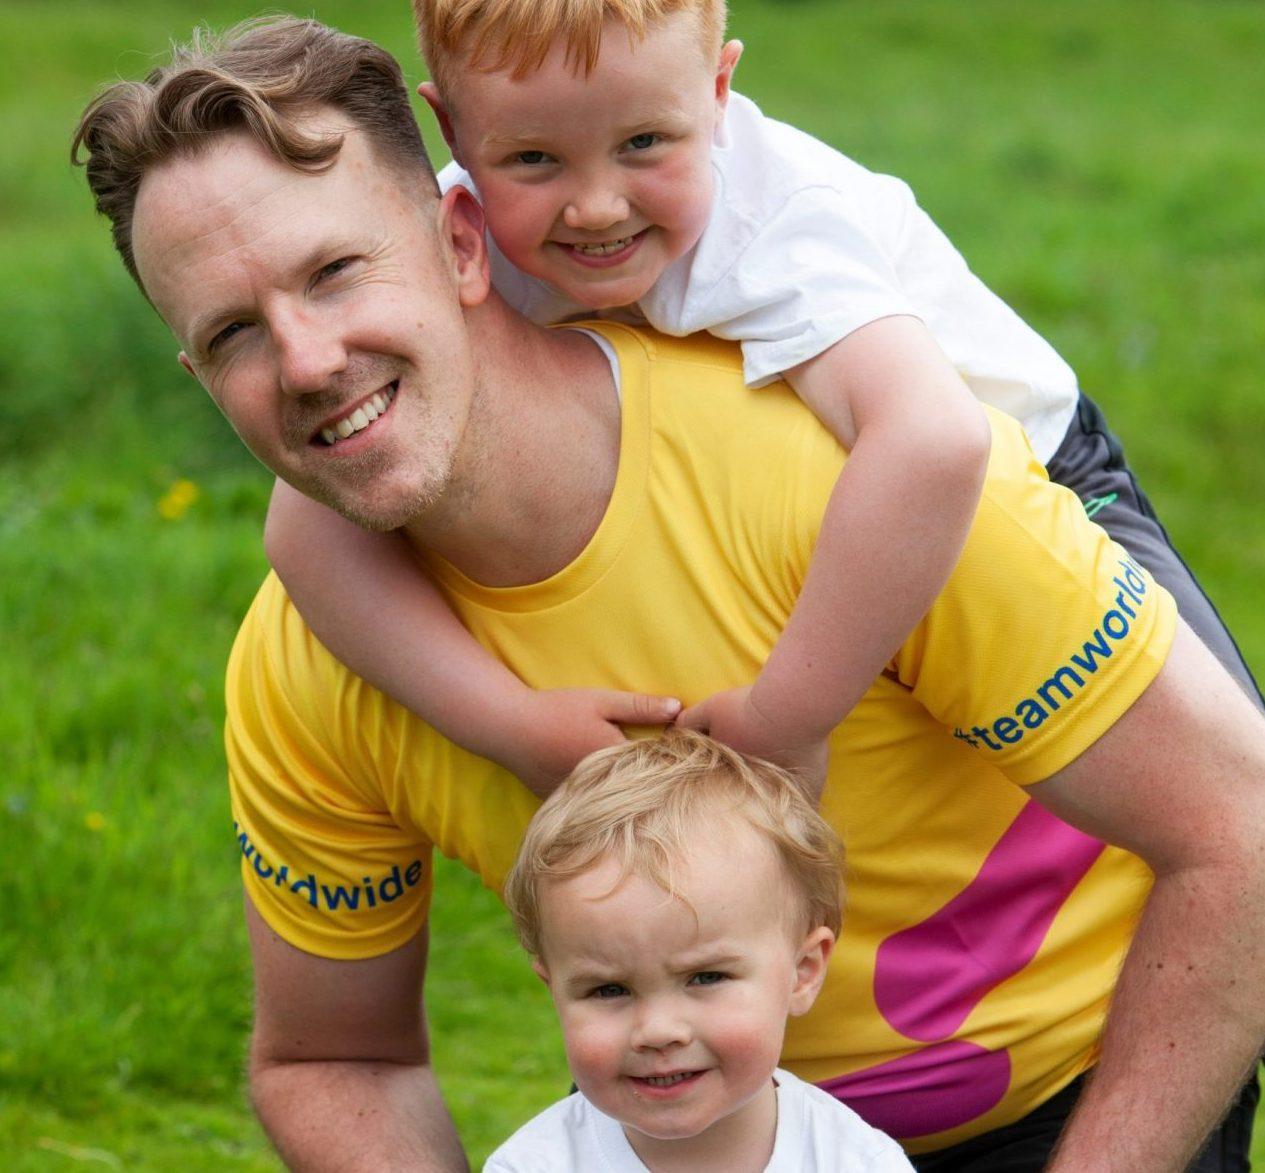 Edinburgh man limbers up for a marathon challenge after beating cancer